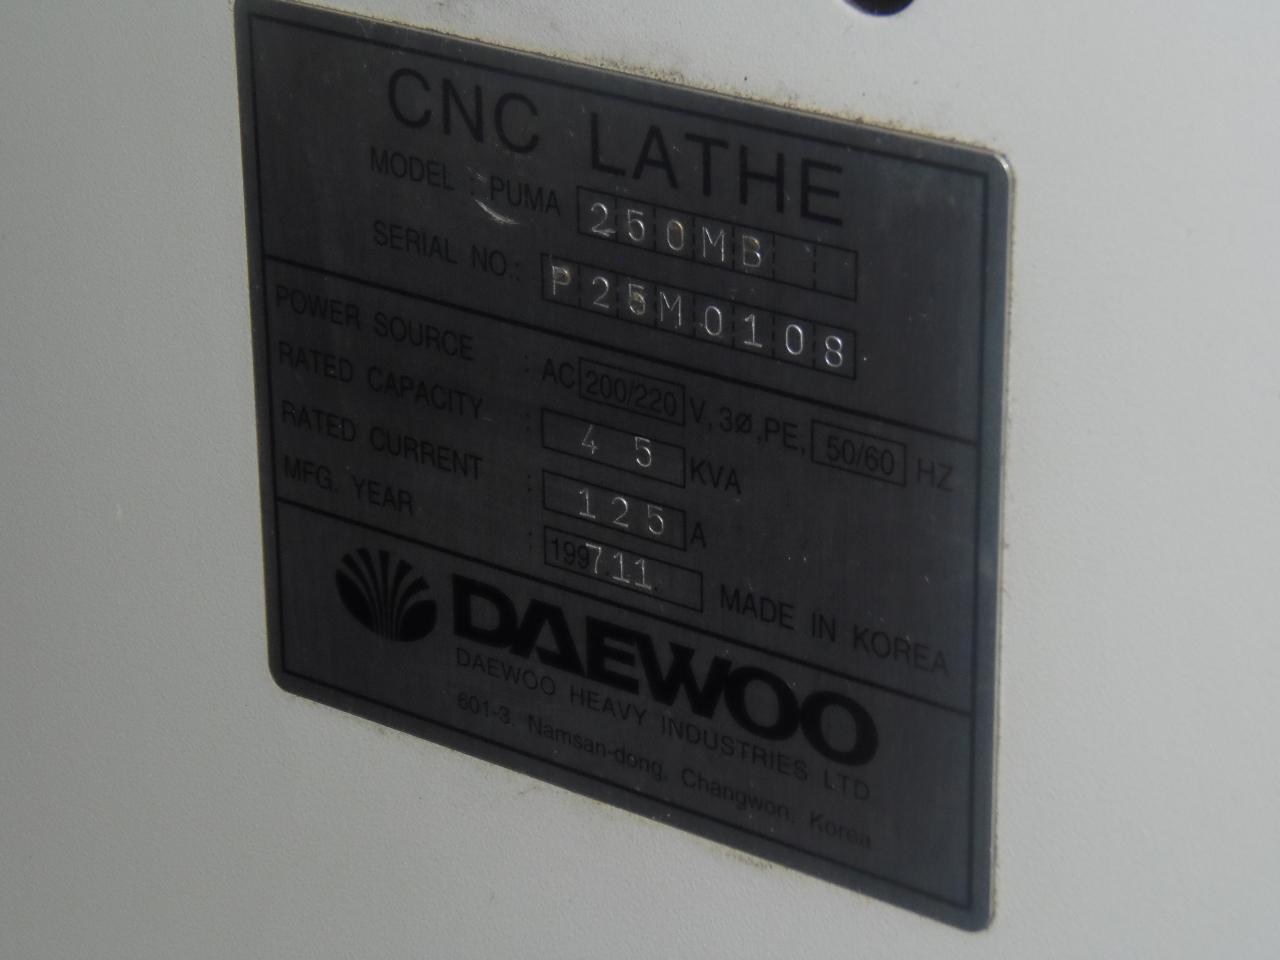 "DAEWOO 250M, LIVE TOOLING, TAILSTOCK, 10"" CHUCK, CHIP CONVEYOR, TOOLING, 1997"